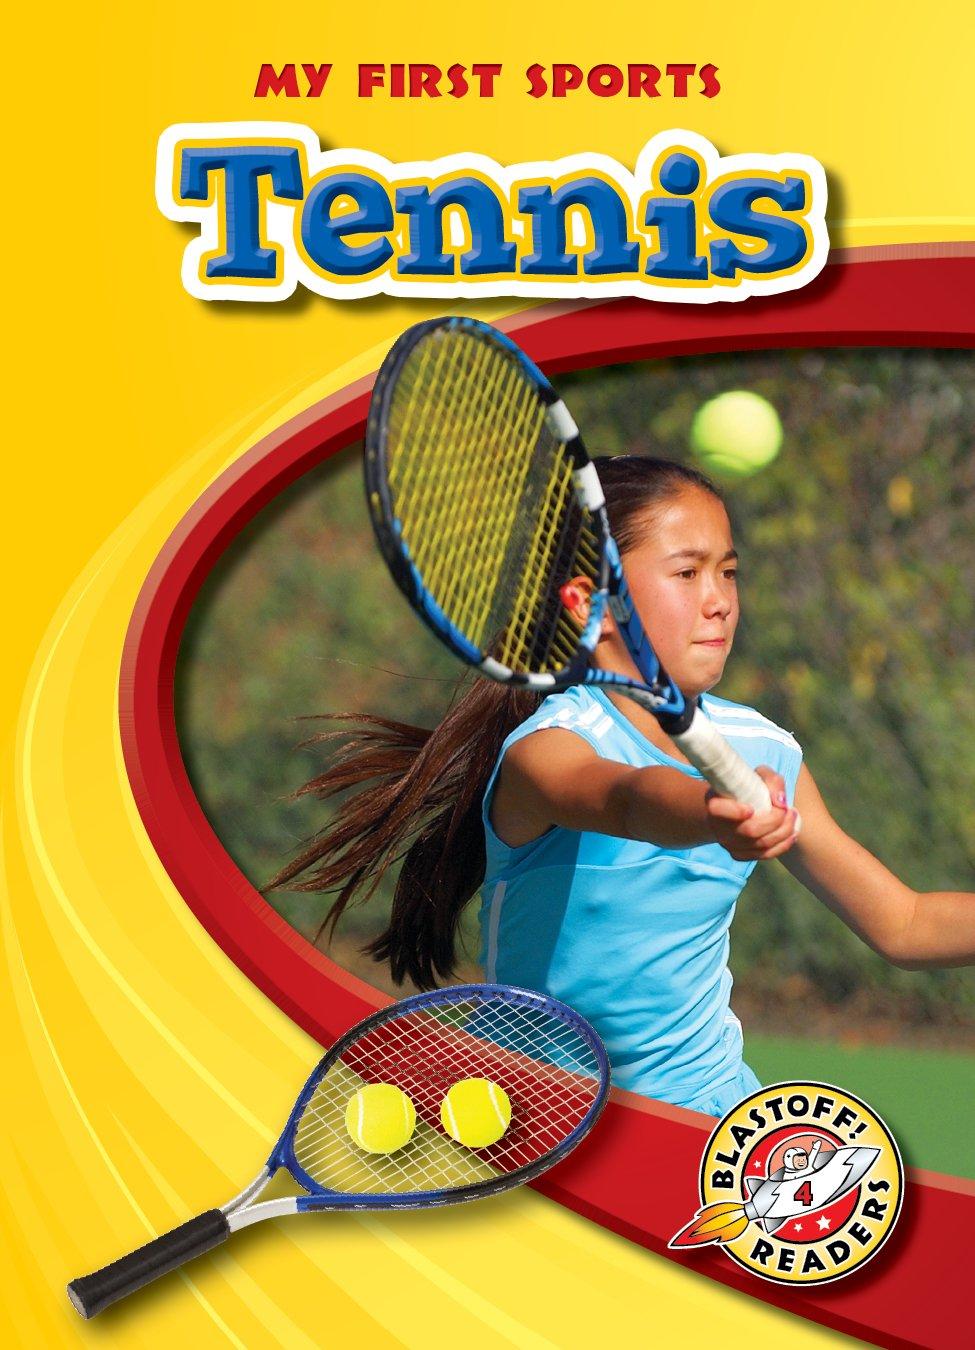 Tennis (Blastoff! Readers: My First Sports Books) (Blastoff Readers. Level 4) by Bellwether Media (Image #1)